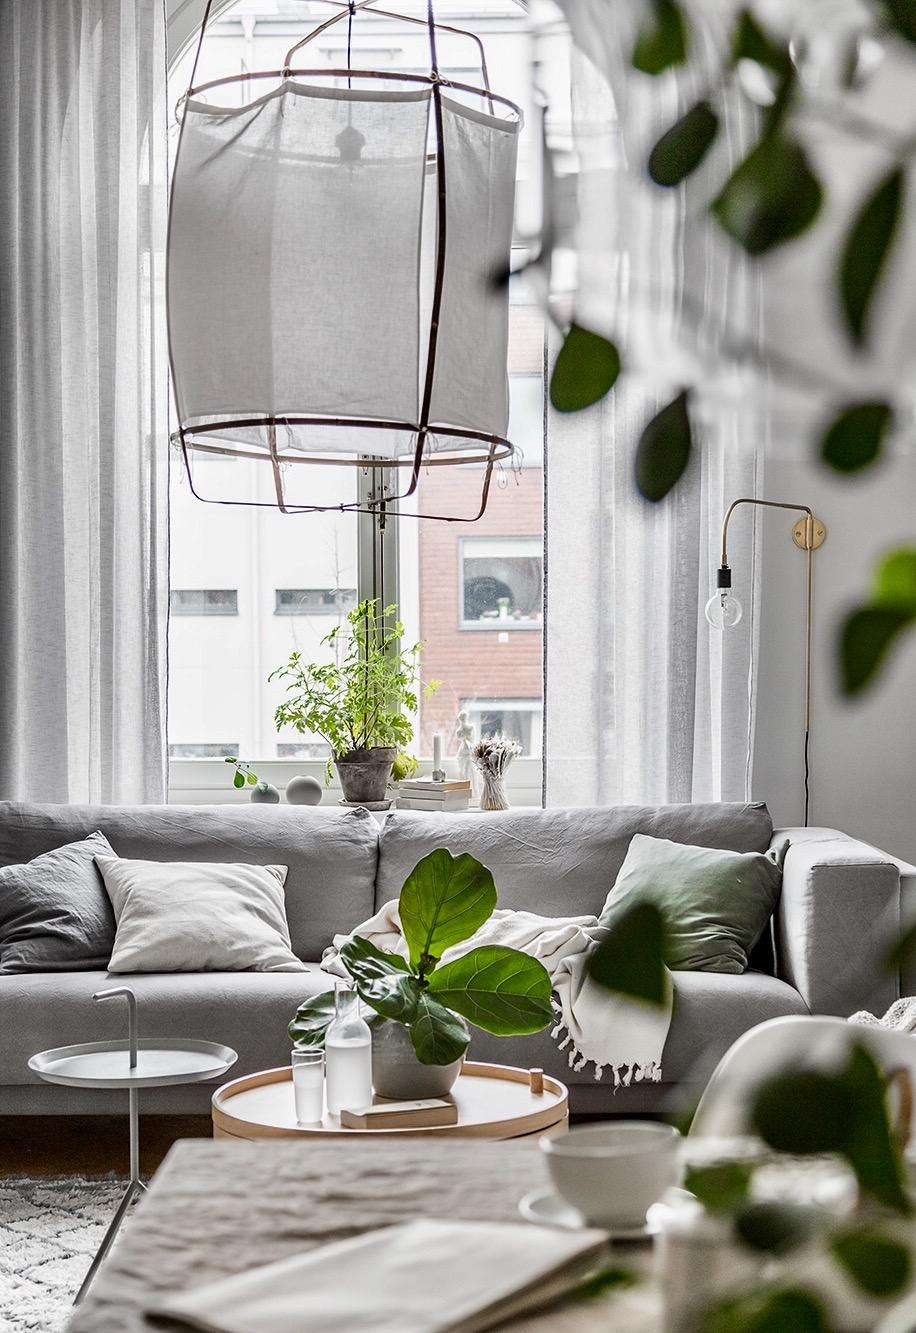 Cozy-Scandinavian-living-room-in-grey-hues.jpg